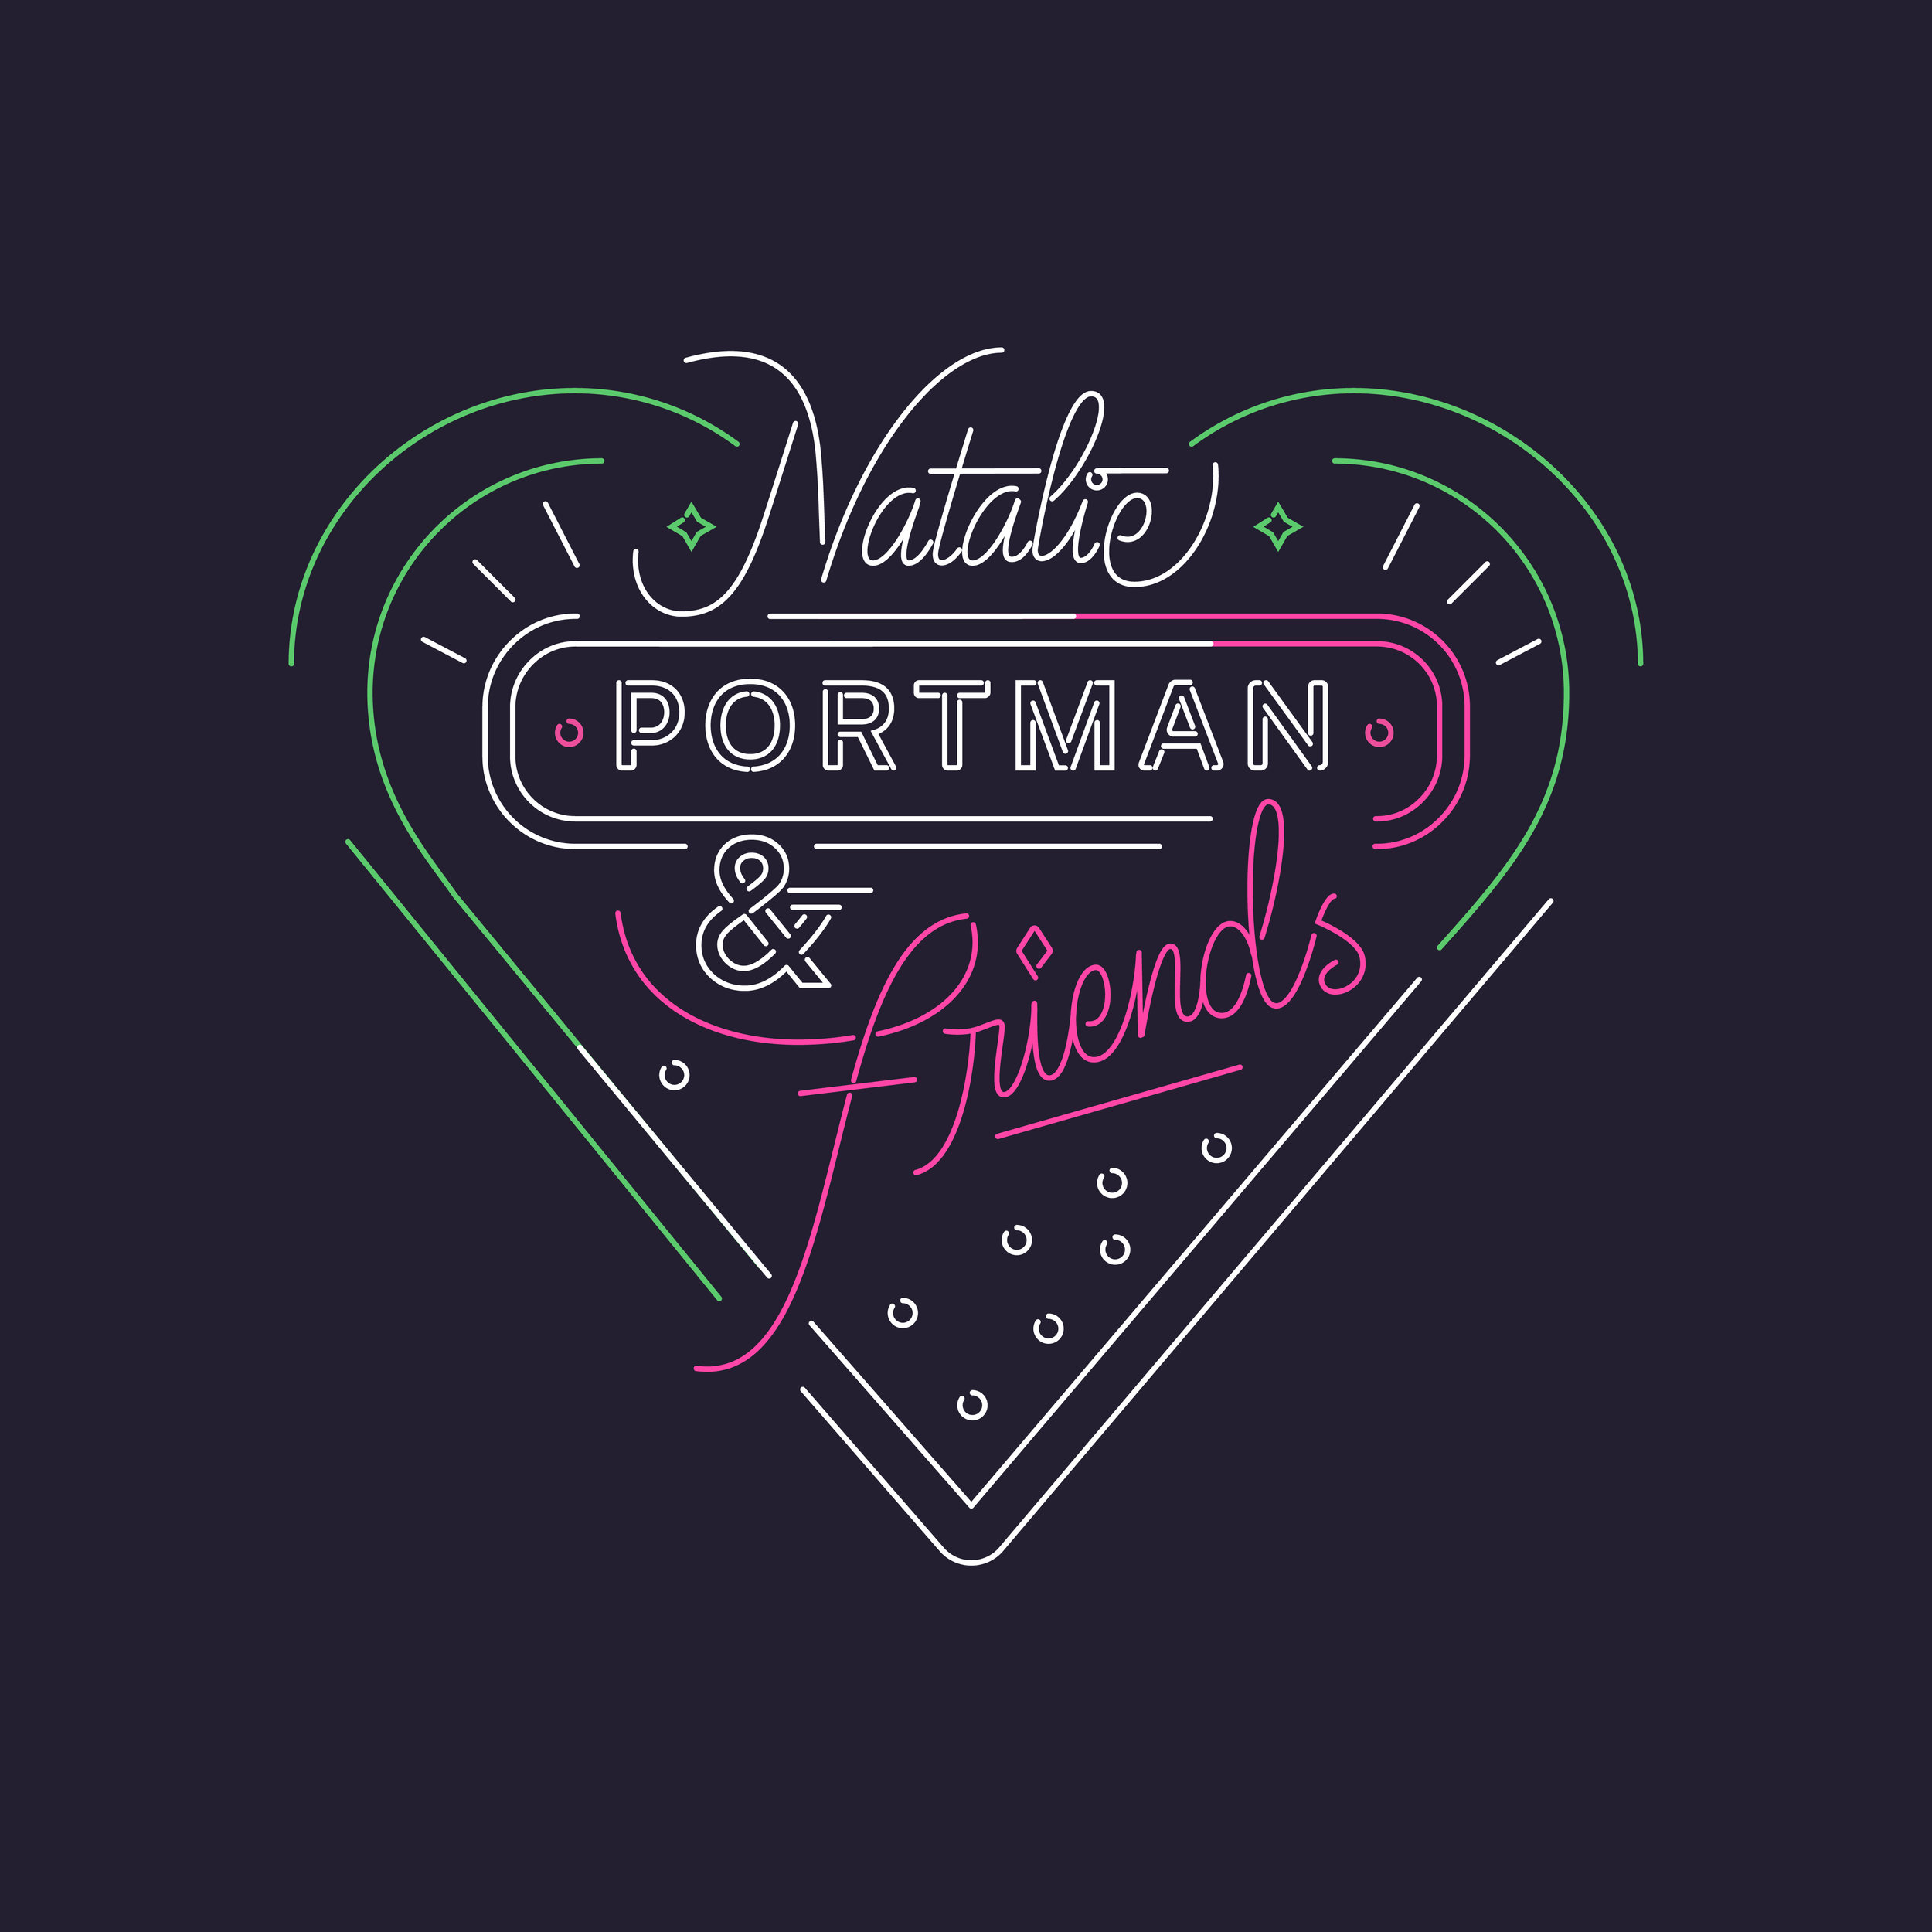 Portman_Neon_f.jpg